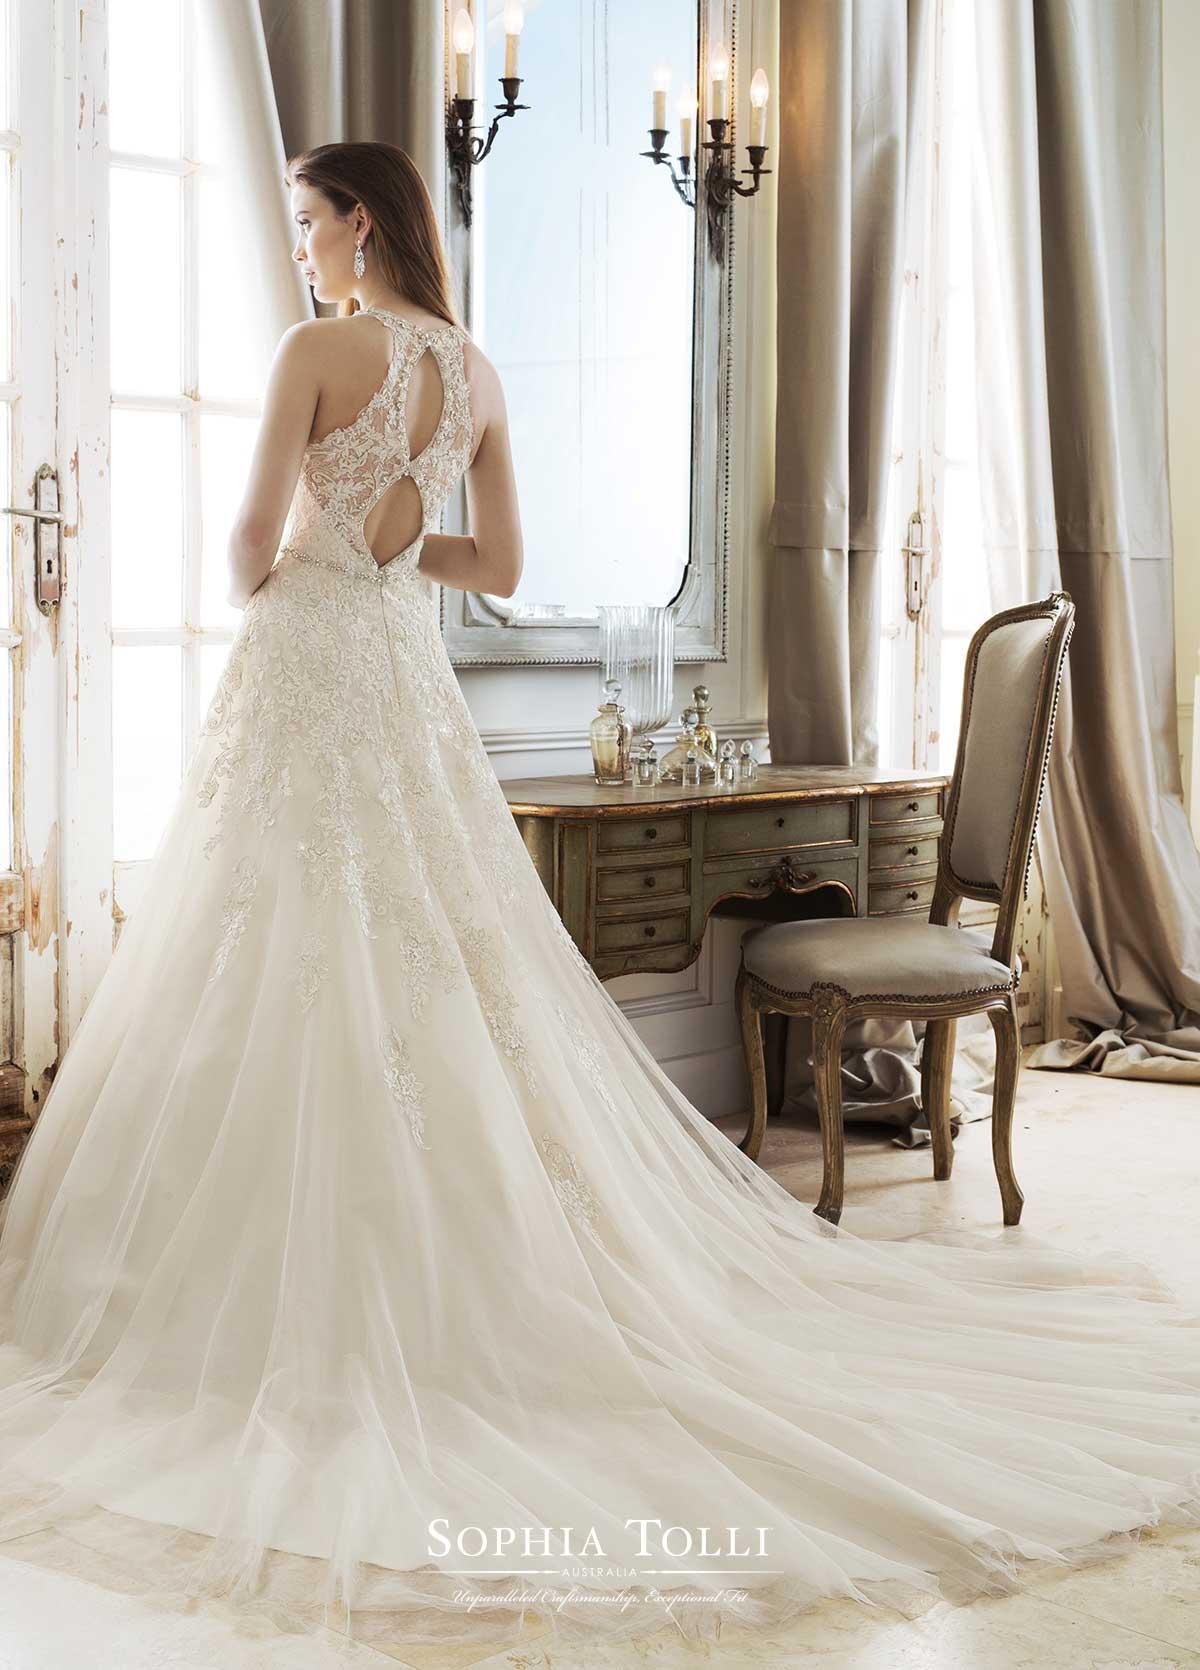 wedding dresses sophia tolli photo - 1